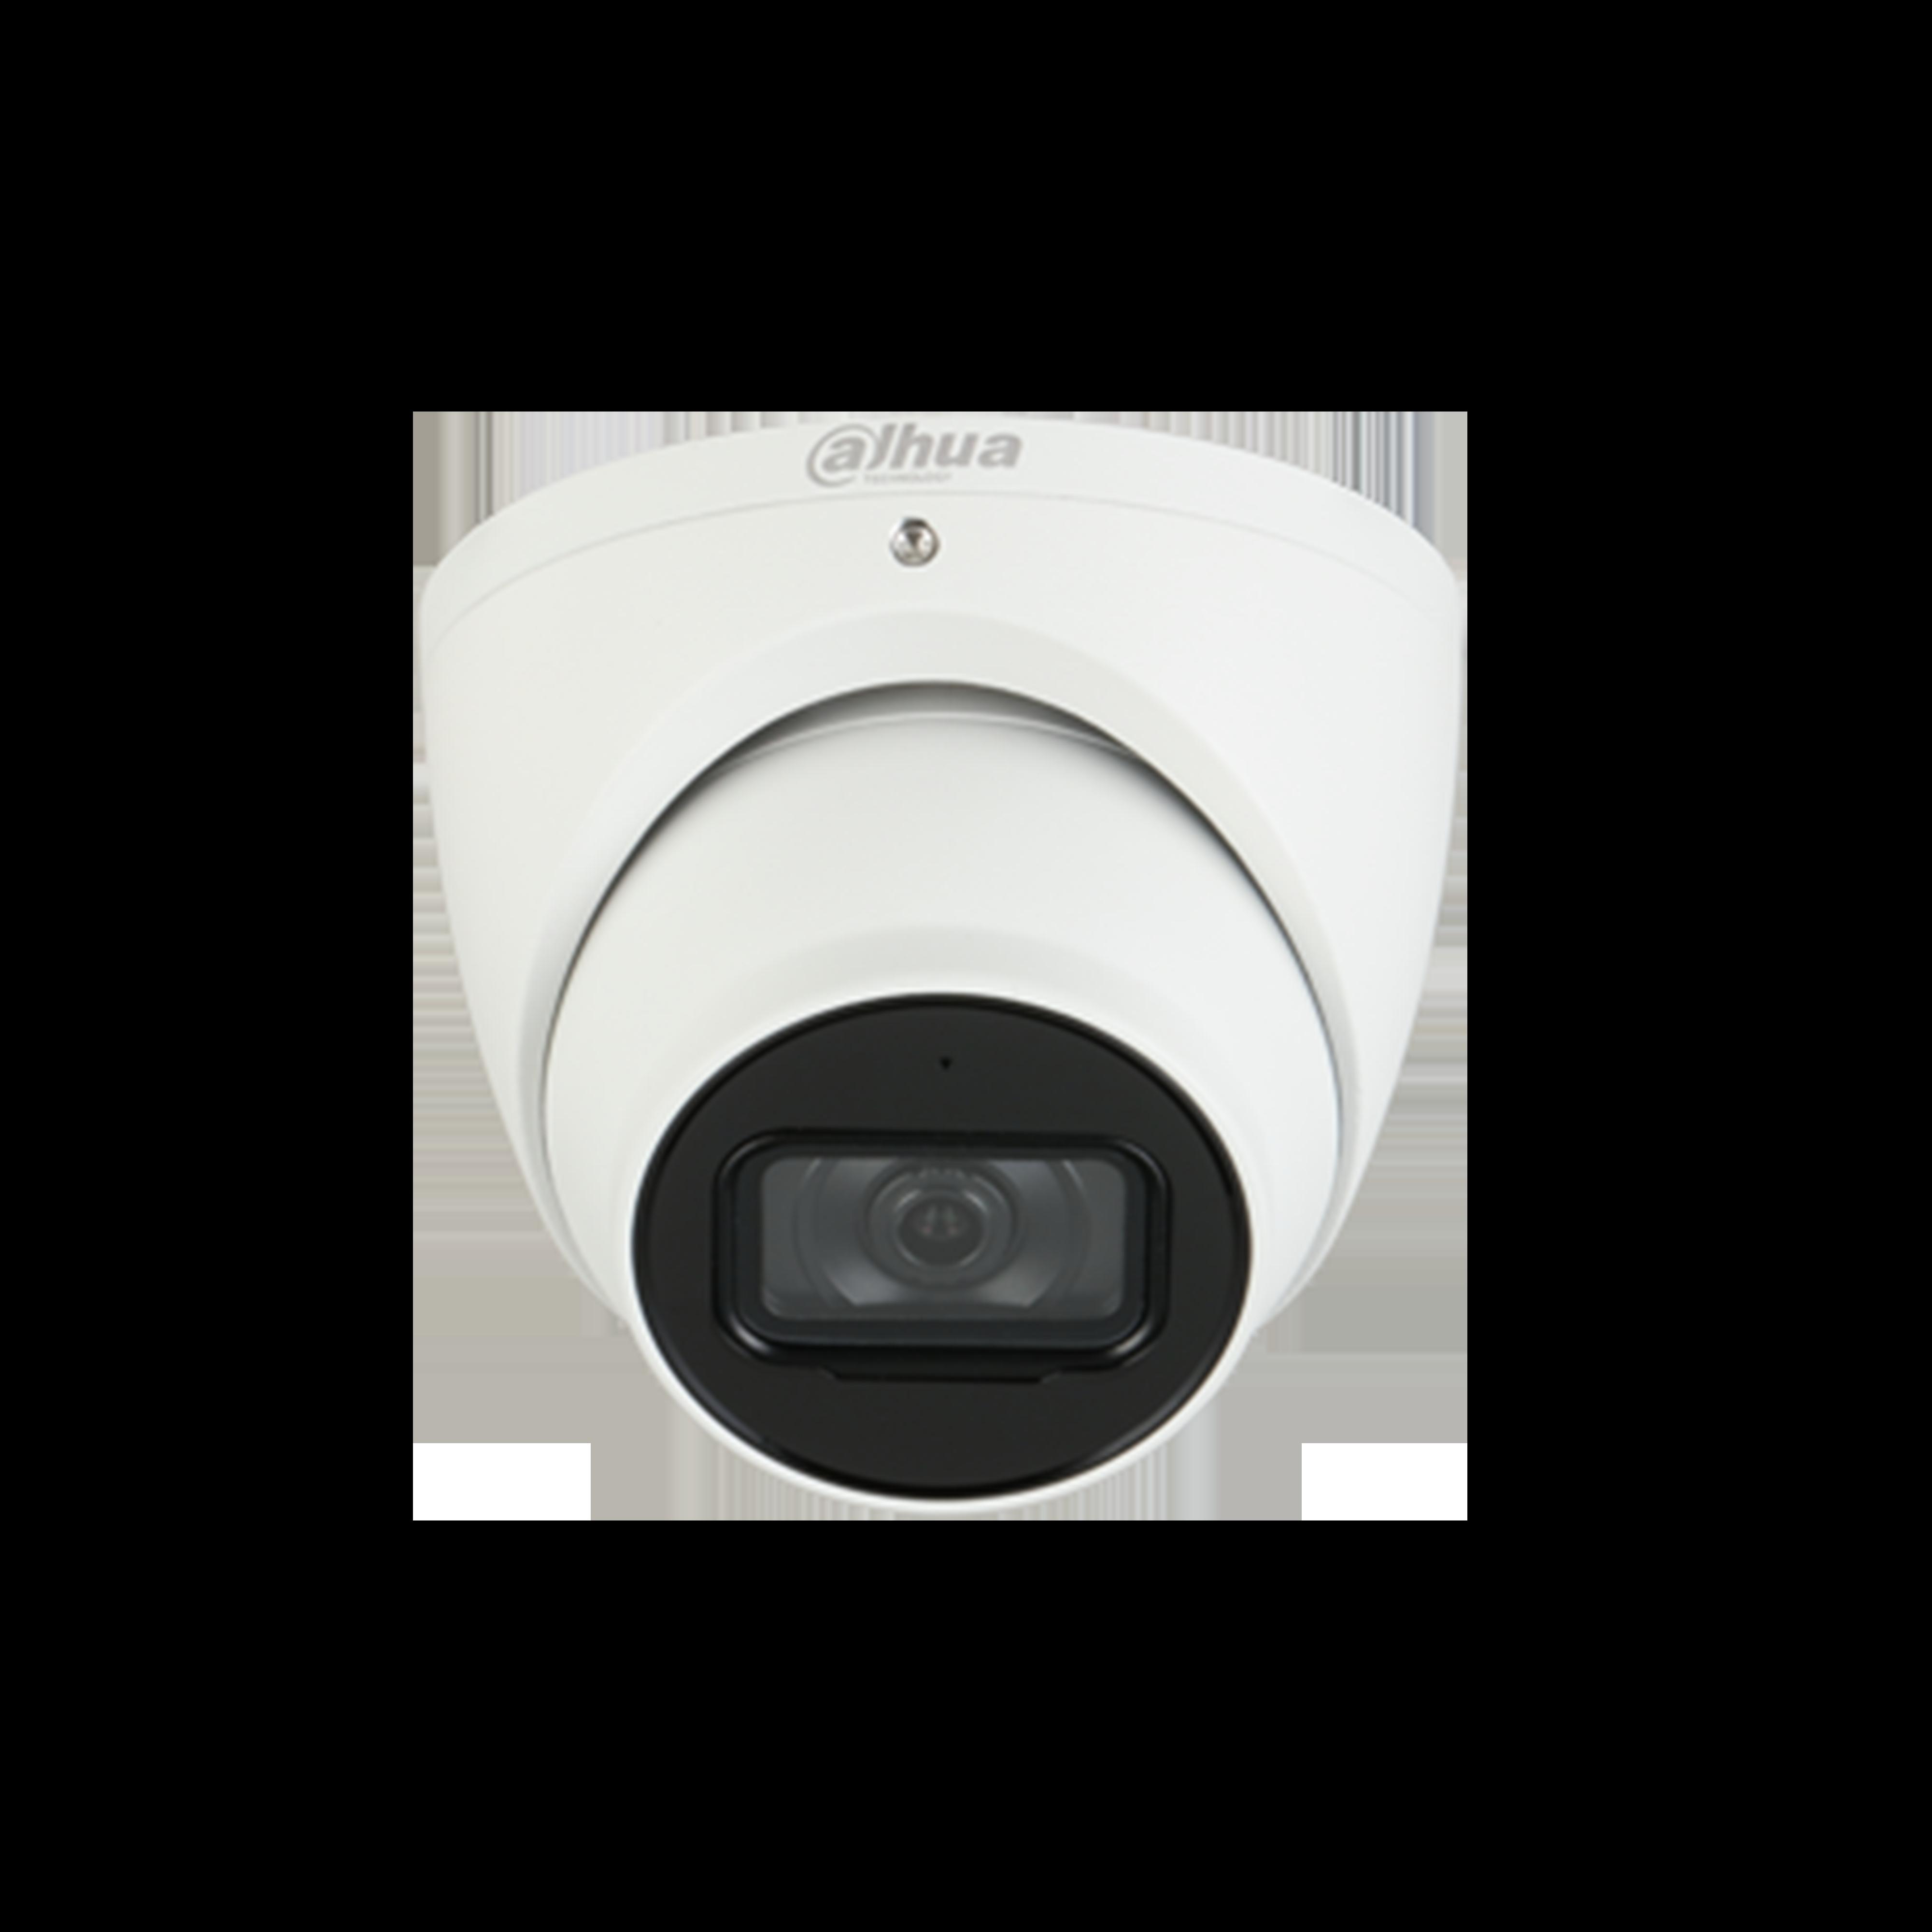 Cámara CCTV seguridad internacional versión IPC-HDW5442TM-ASE 4MP IP micrófono integrado WDR IR50M Eyeball AI cámara de red BESDER, 1080P, FHD, Mini cámara WiFi con detección de forma humana IA, cámara IP impermeable, Audio bidireccional, visión nocturna IR, CCTV, vigilancia